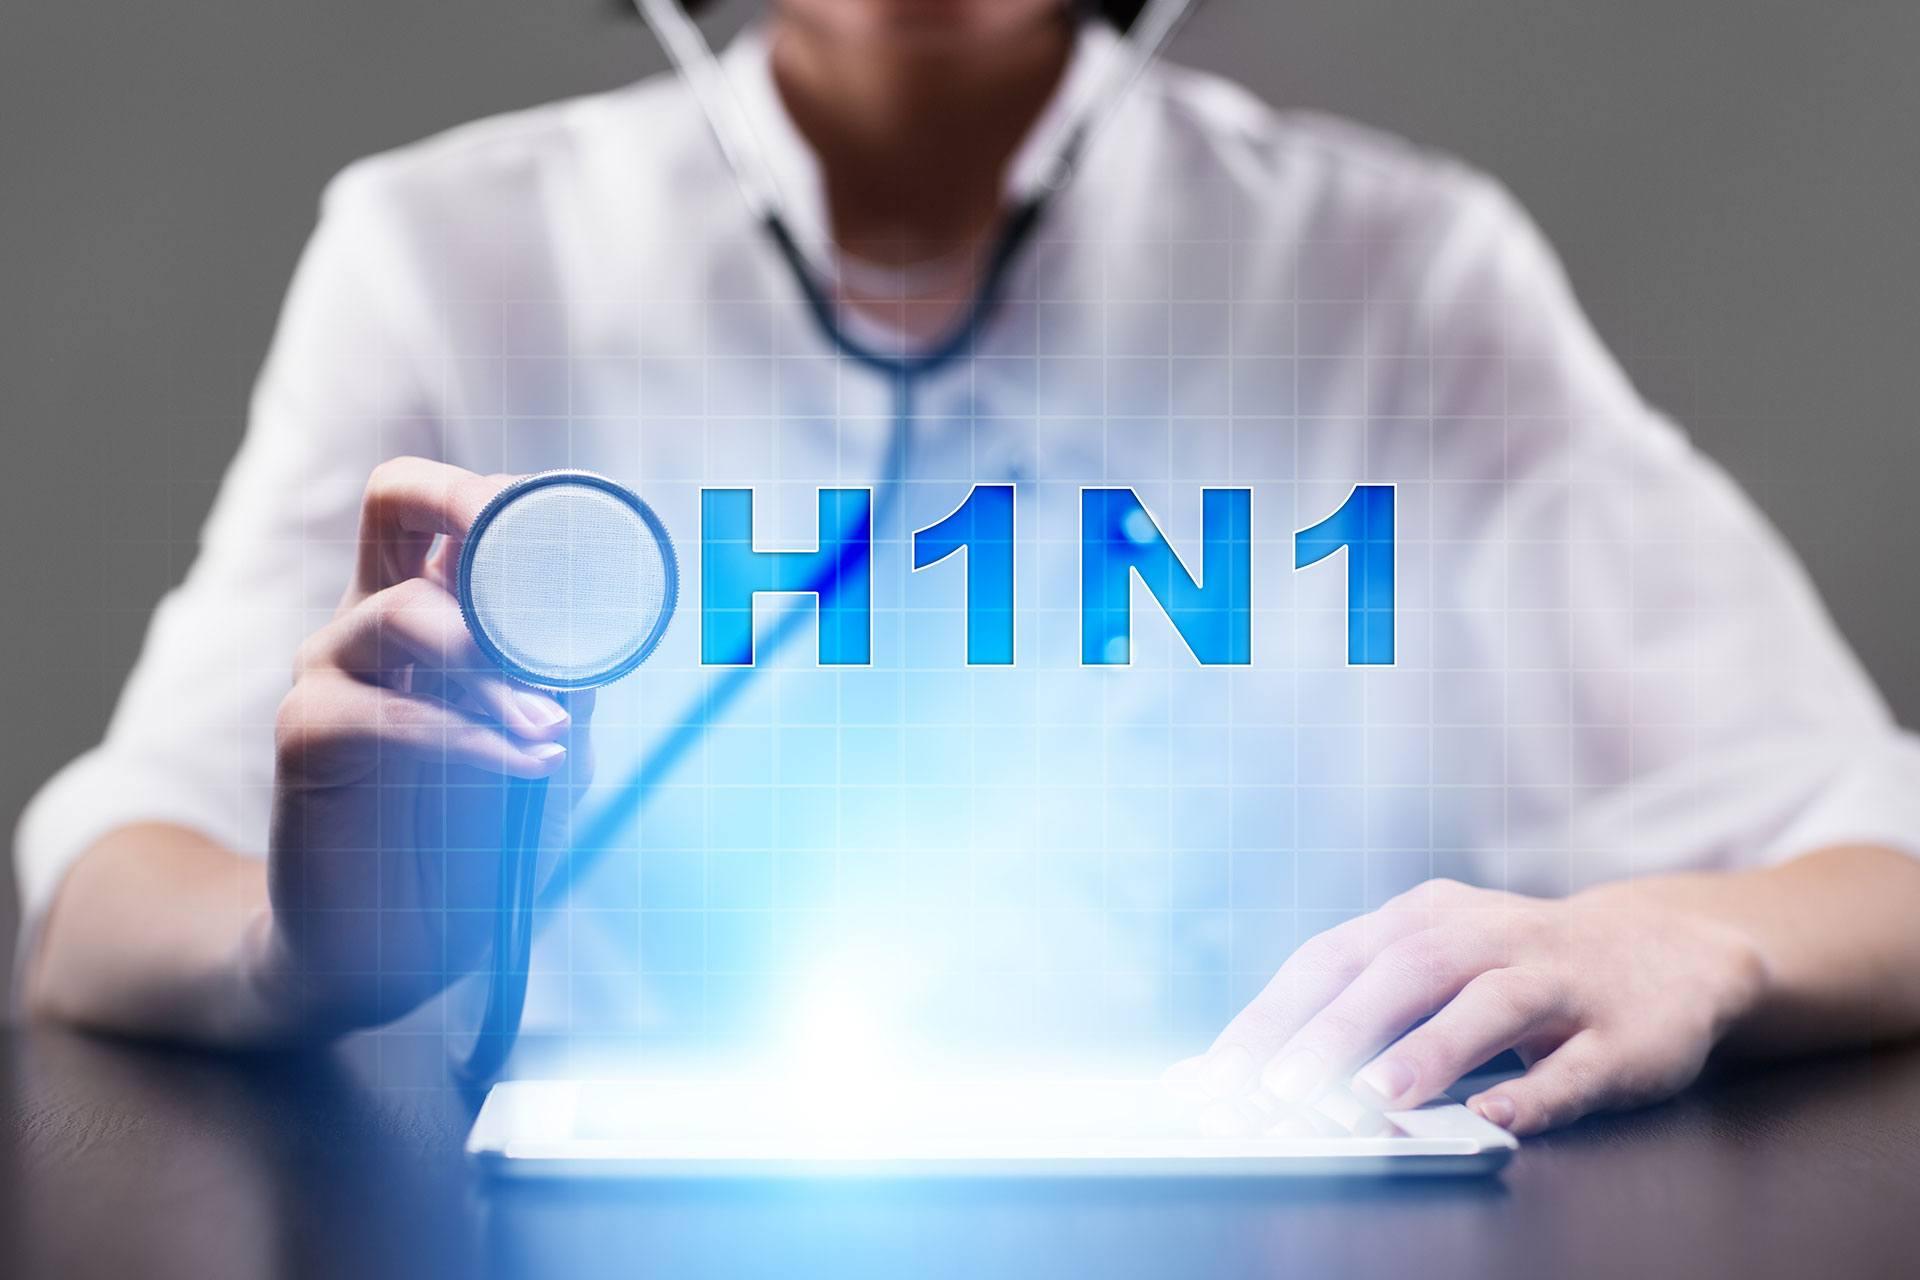 Desvendando a gripe H1N1